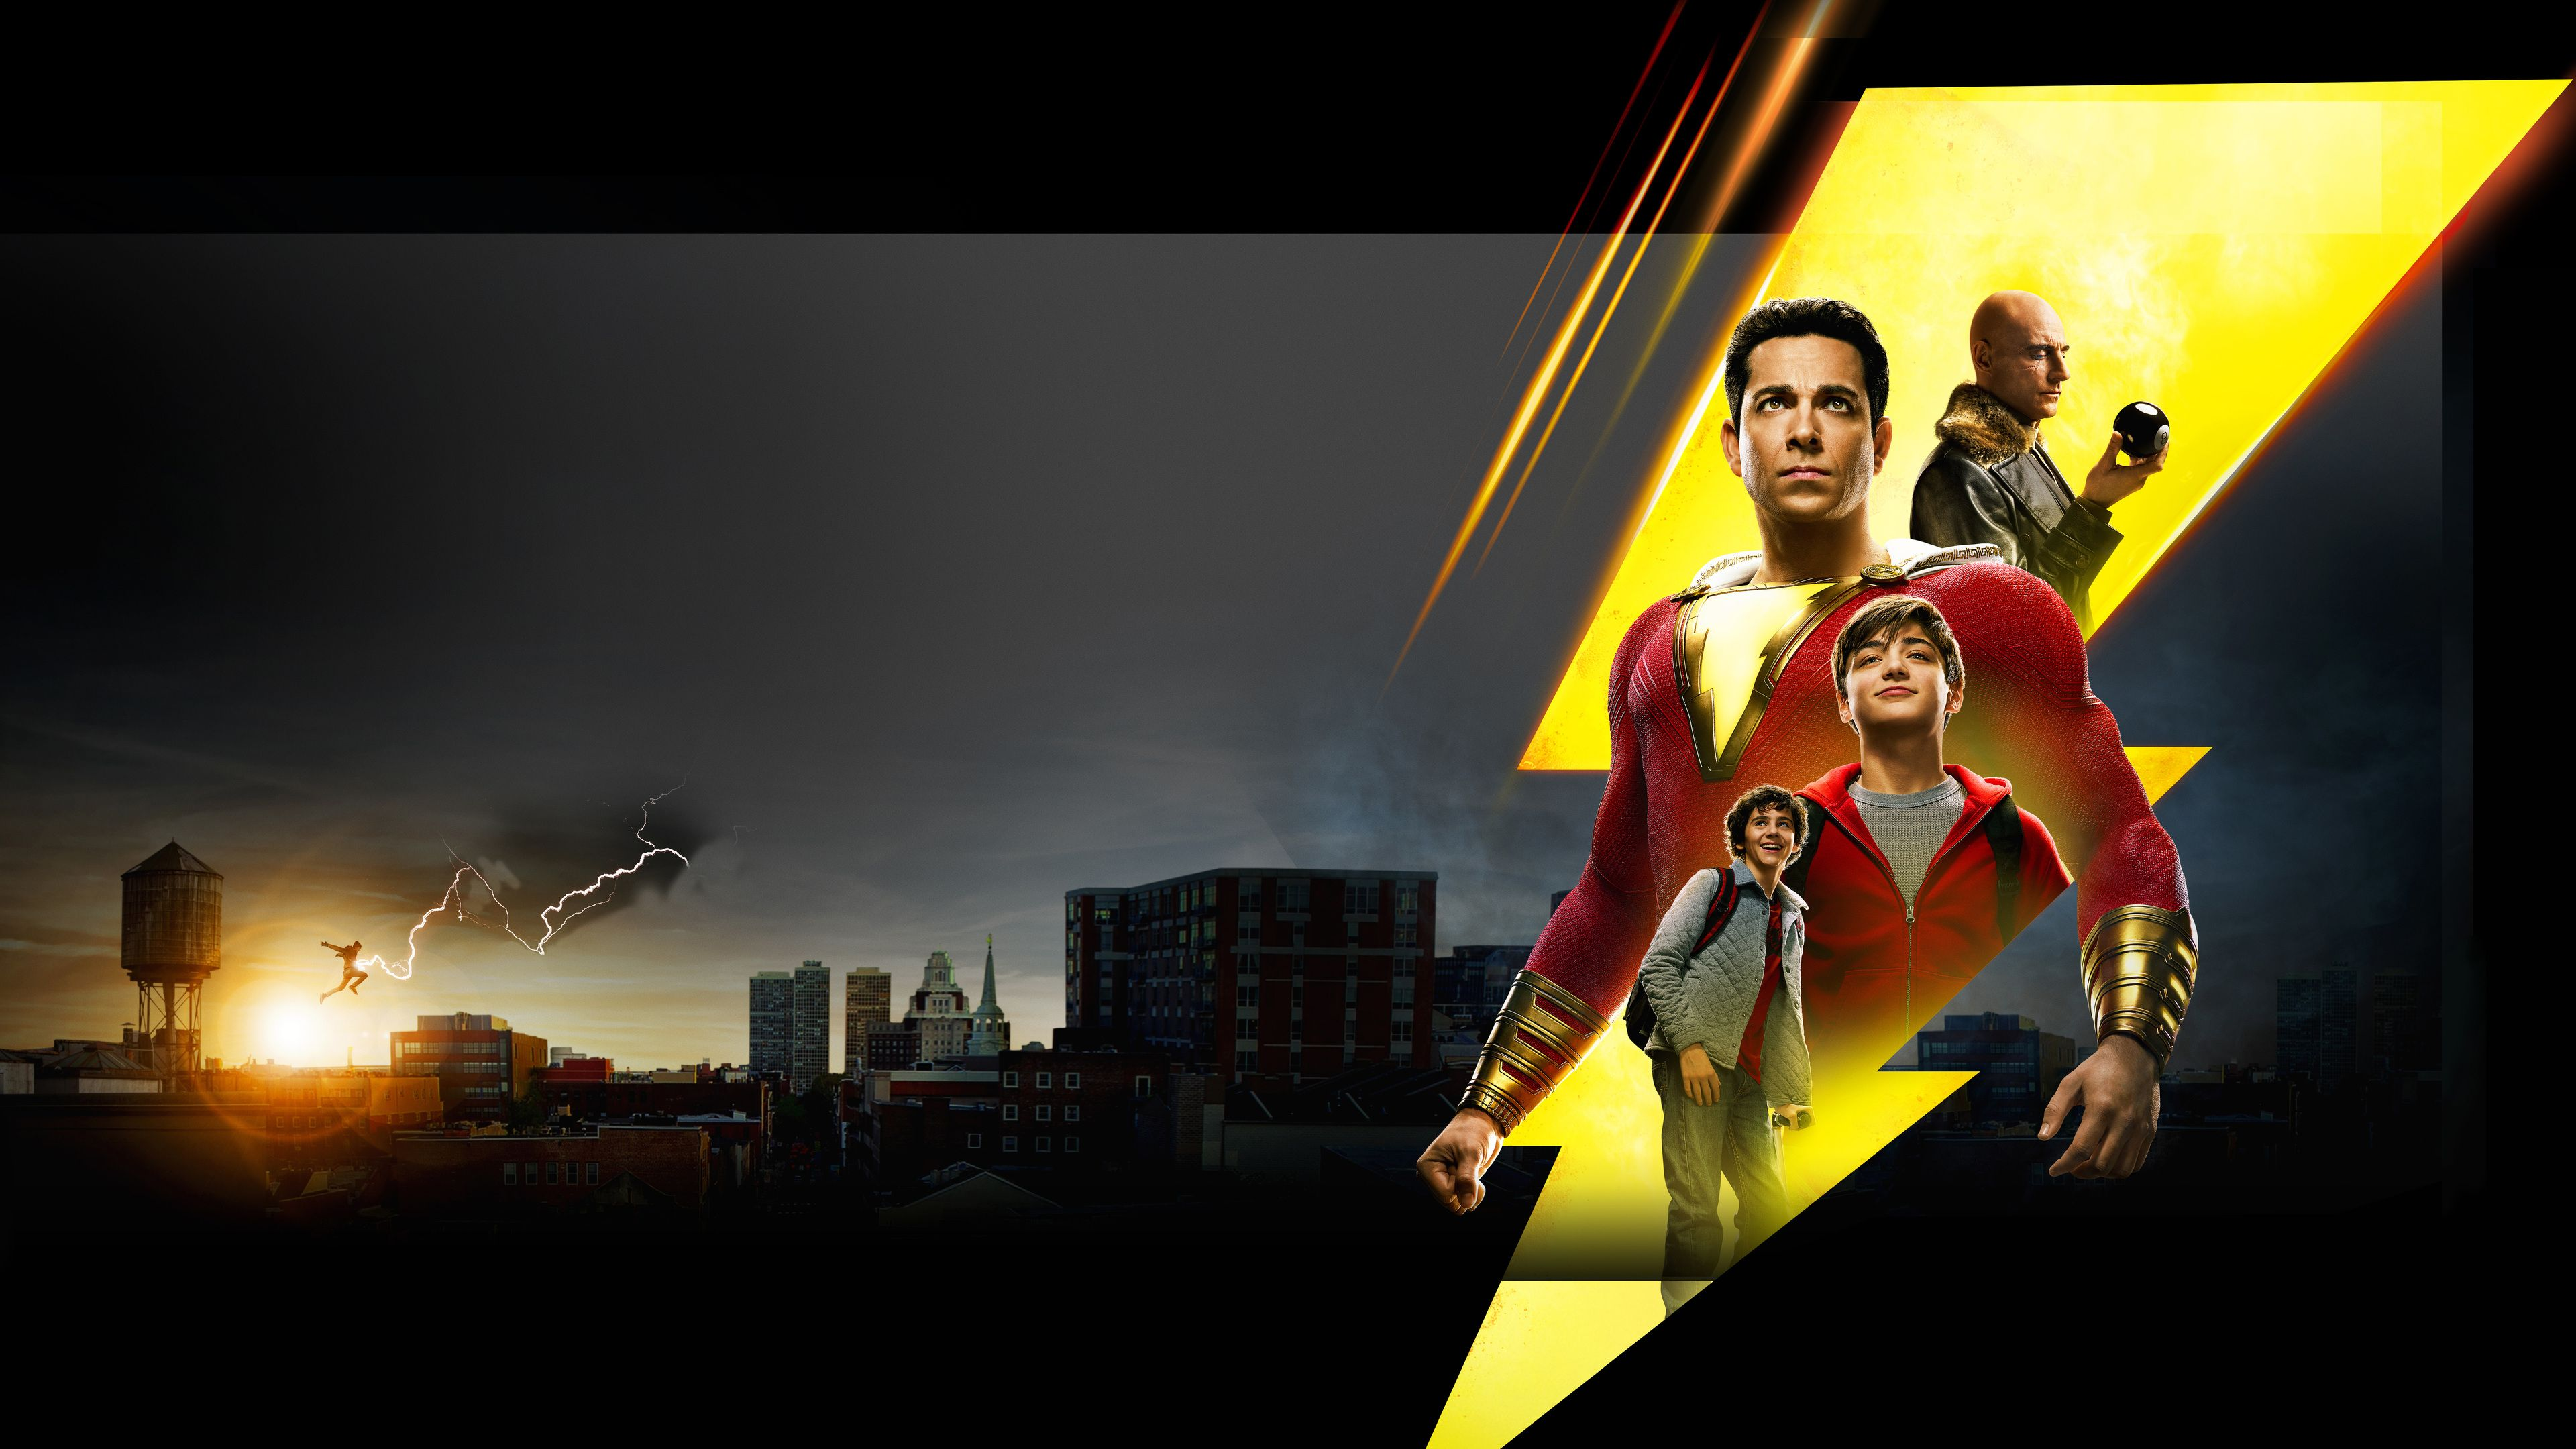 Wallpaper 4k Shazam New Poster 4k 2019 Movies Wallpapers 4k